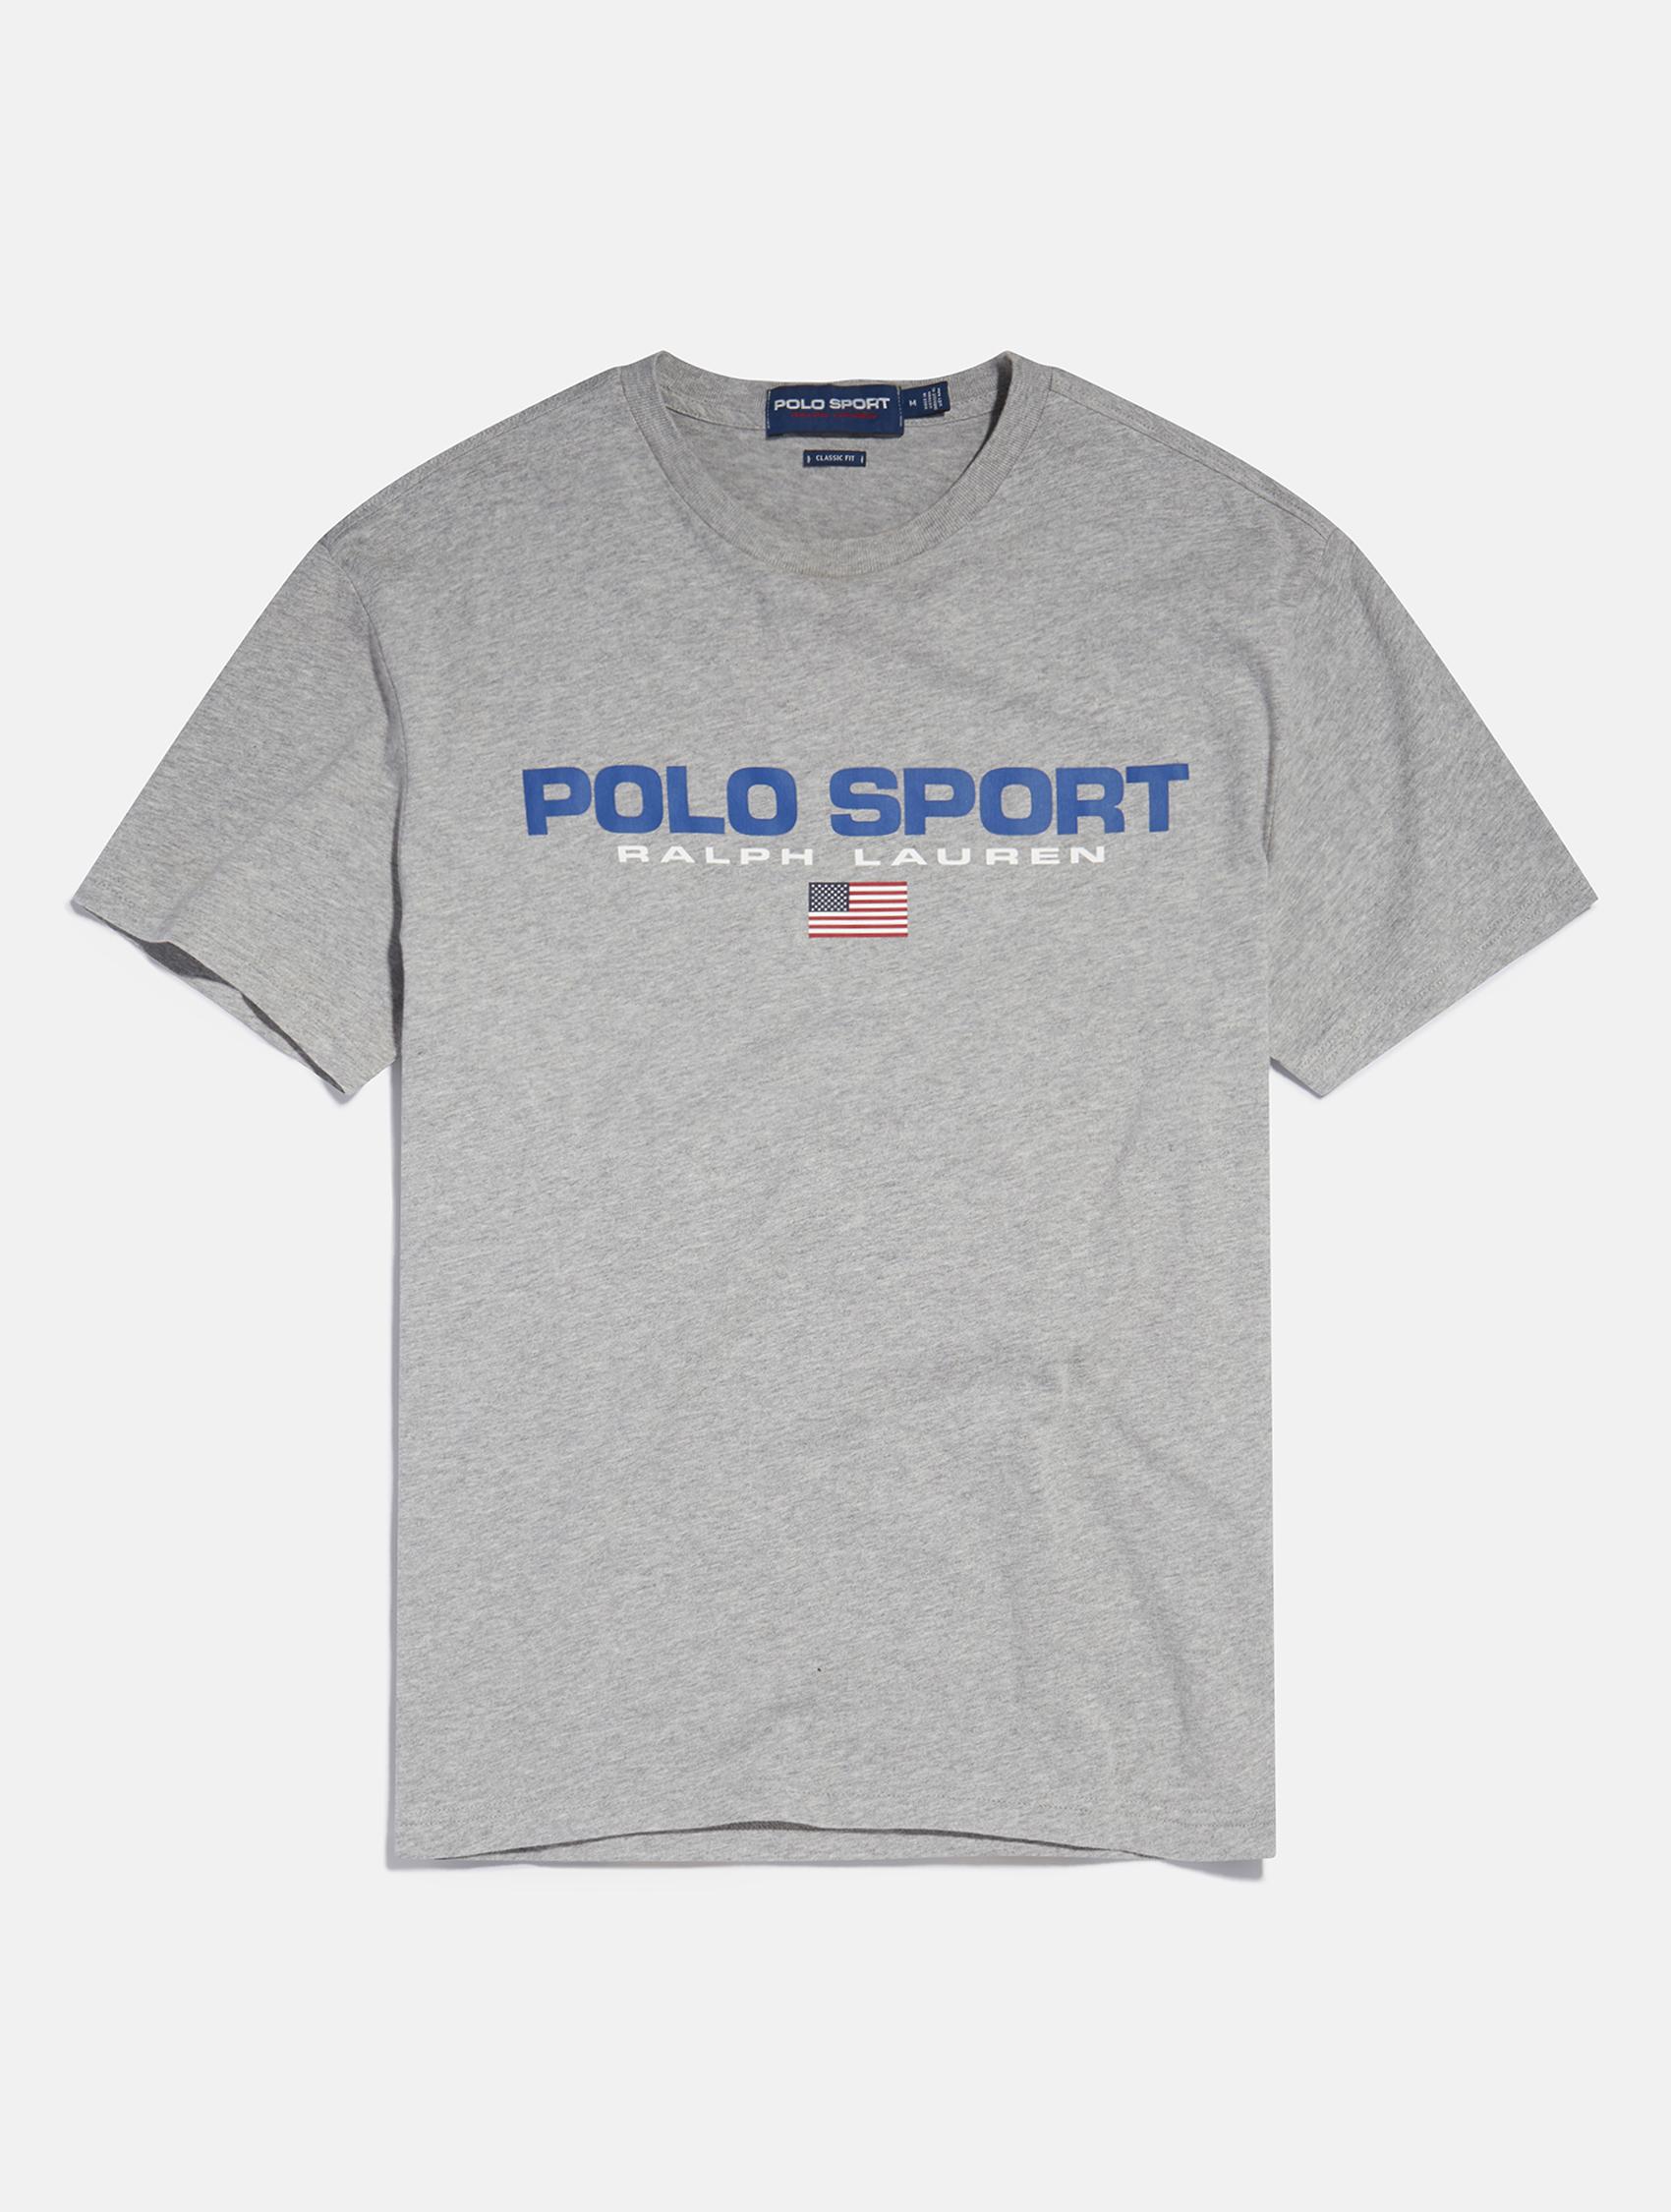 Polo Sport Ralph Lauren Shirt in light grey   eCommerce Photography London